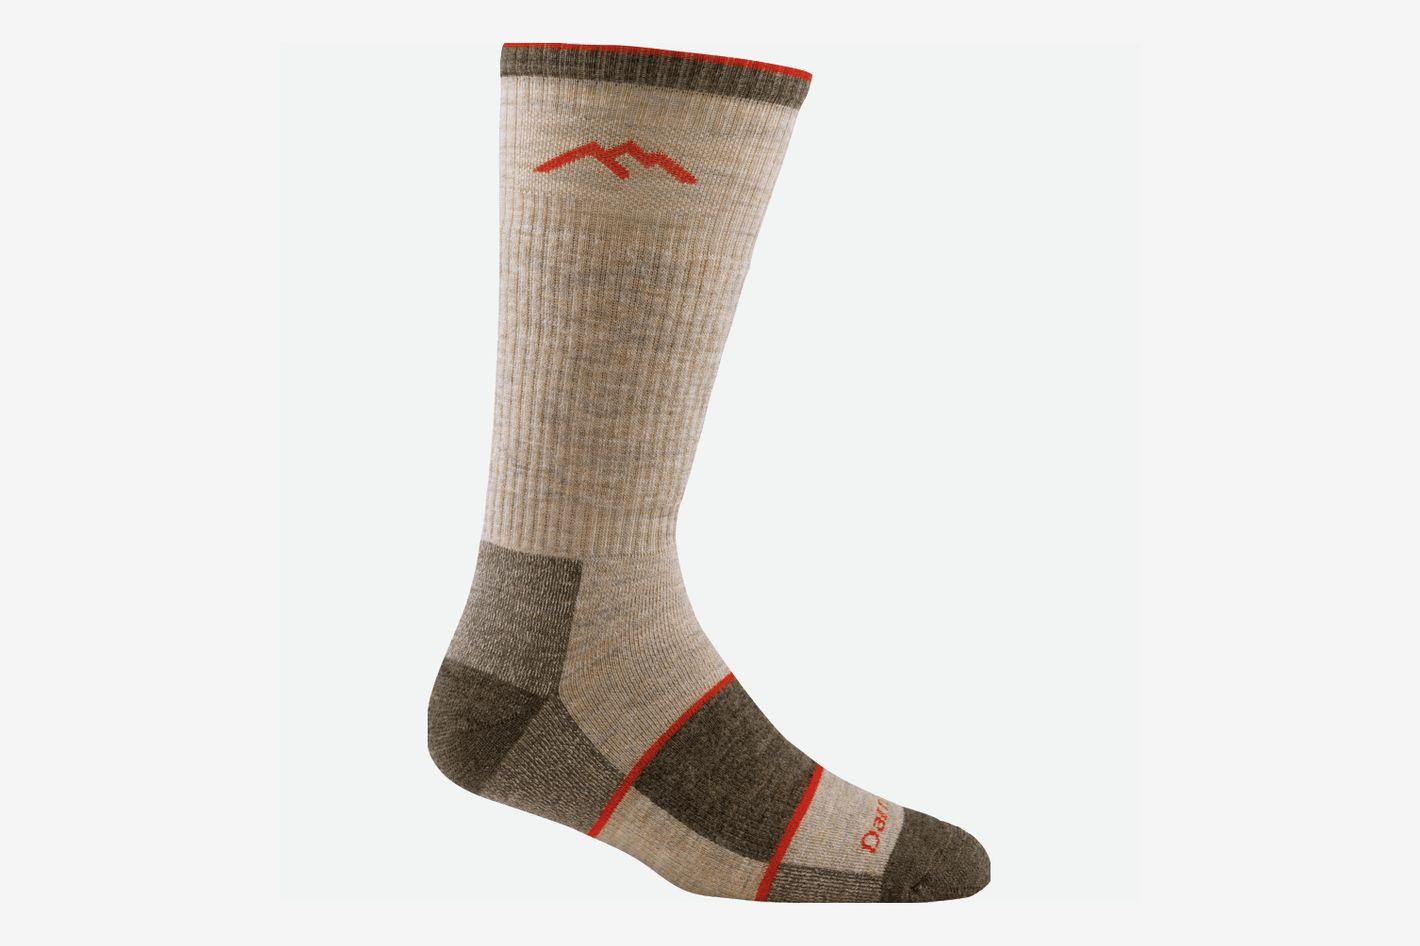 80addf6f2d7 Darn Tough Merino Wool Boot Sock Full Cushion at Amazon